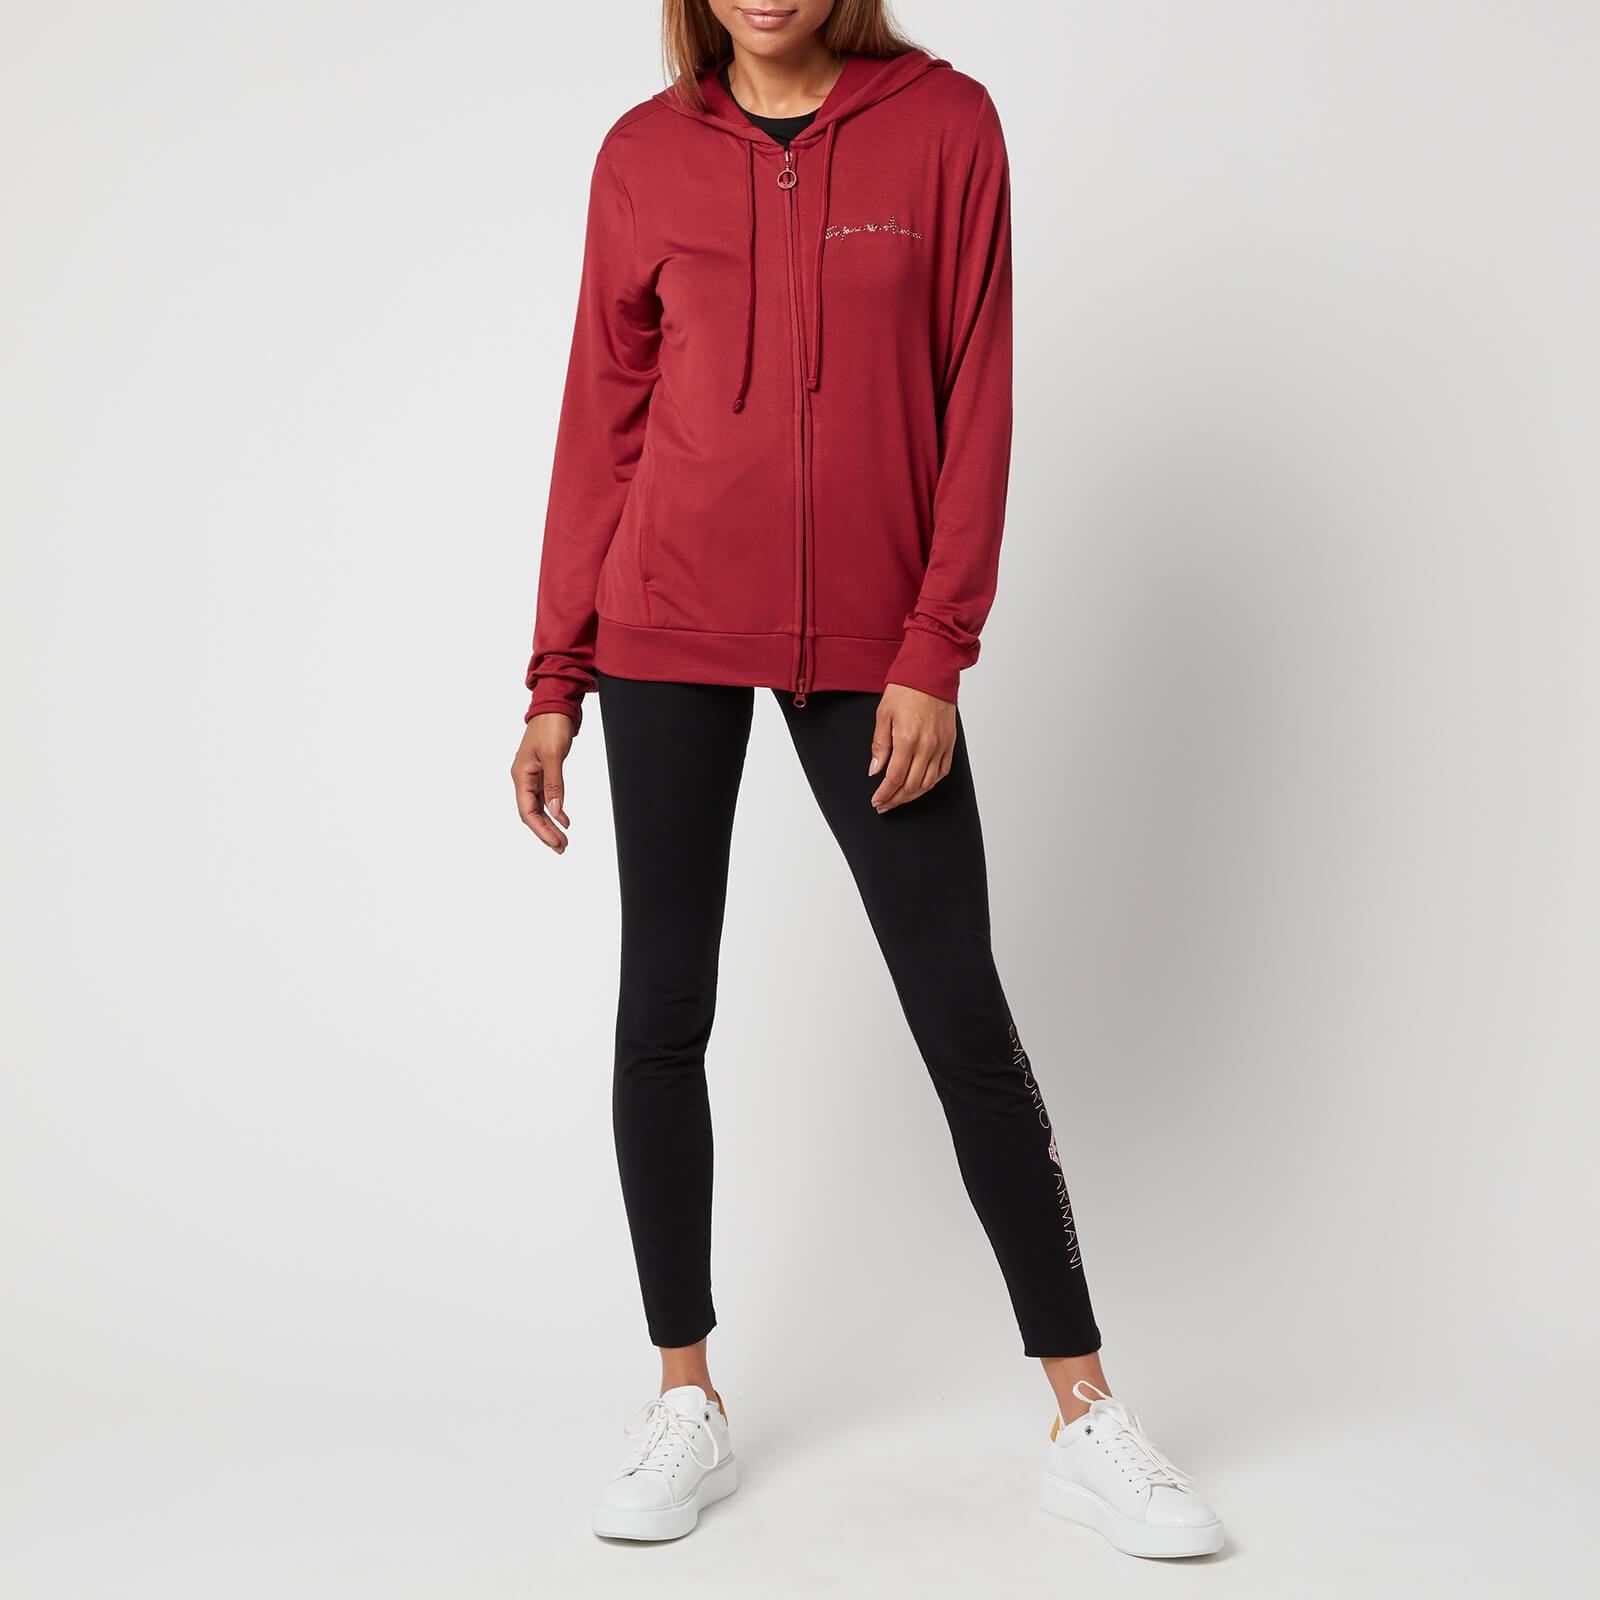 emporio armani loungewear women's signature full zip jacket with hood - pomegranate - xs